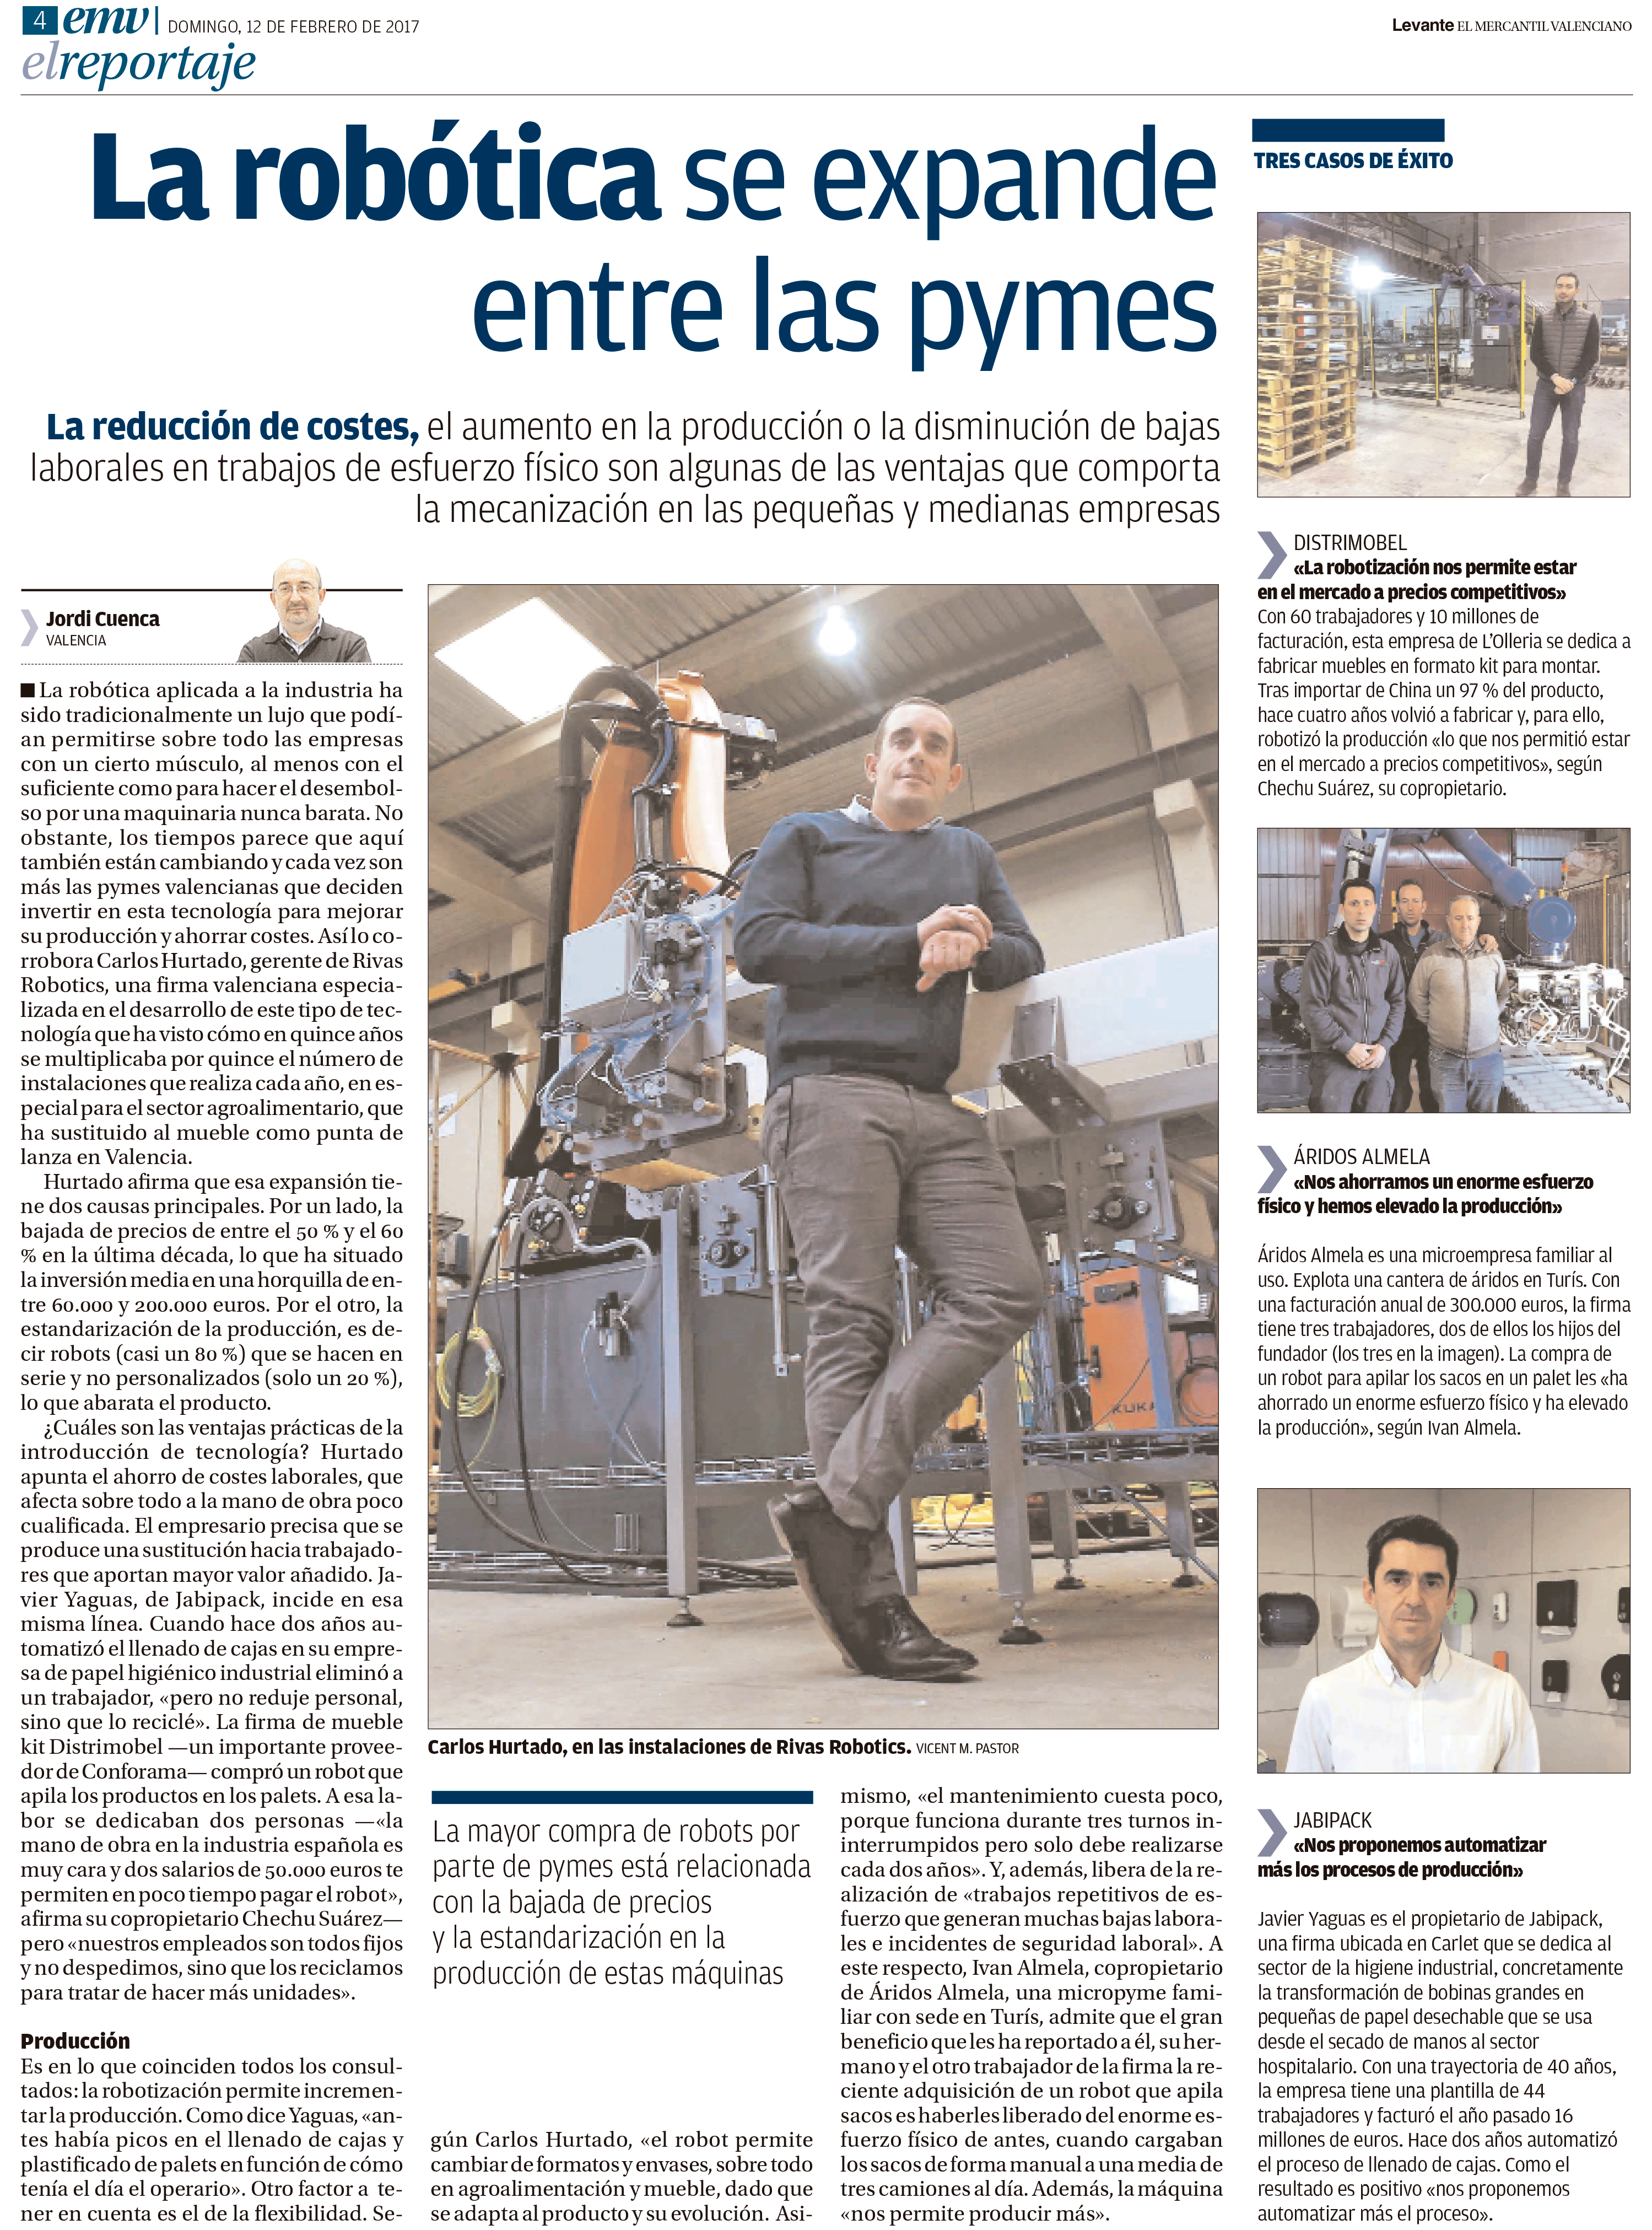 La rob tica se expande entre las pymes reportaje a rivas robotics de levante el mecantil valenciano - Periodico levante el mercantil valenciano ...